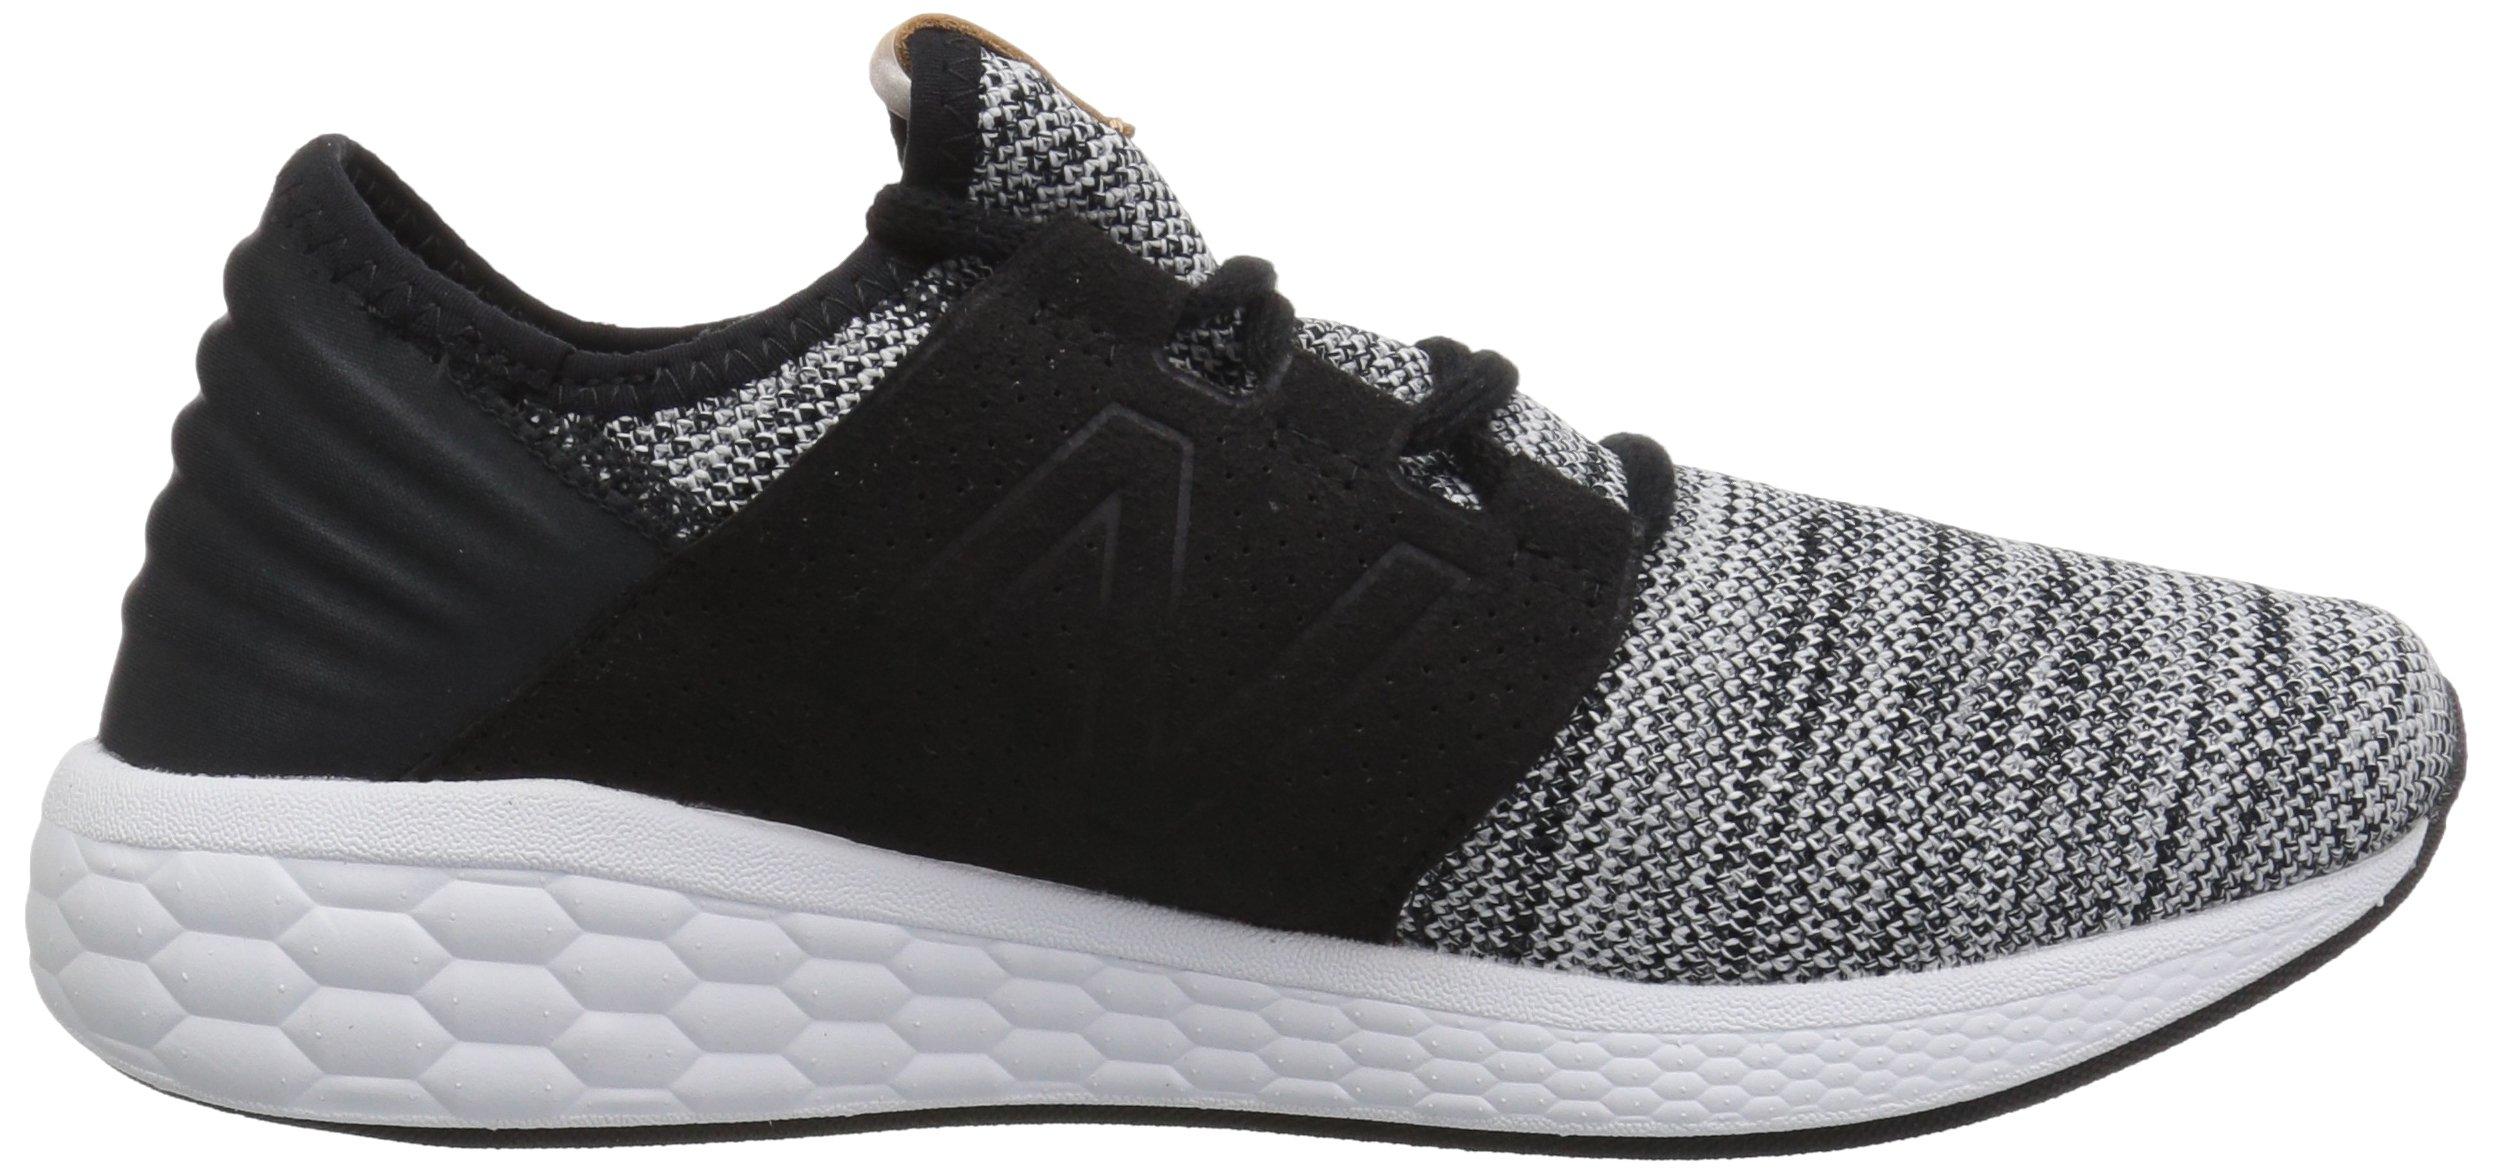 New Balance Men's Cruz V2 Fresh Foam Running Shoe, white/black, 7 D US by New Balance (Image #6)